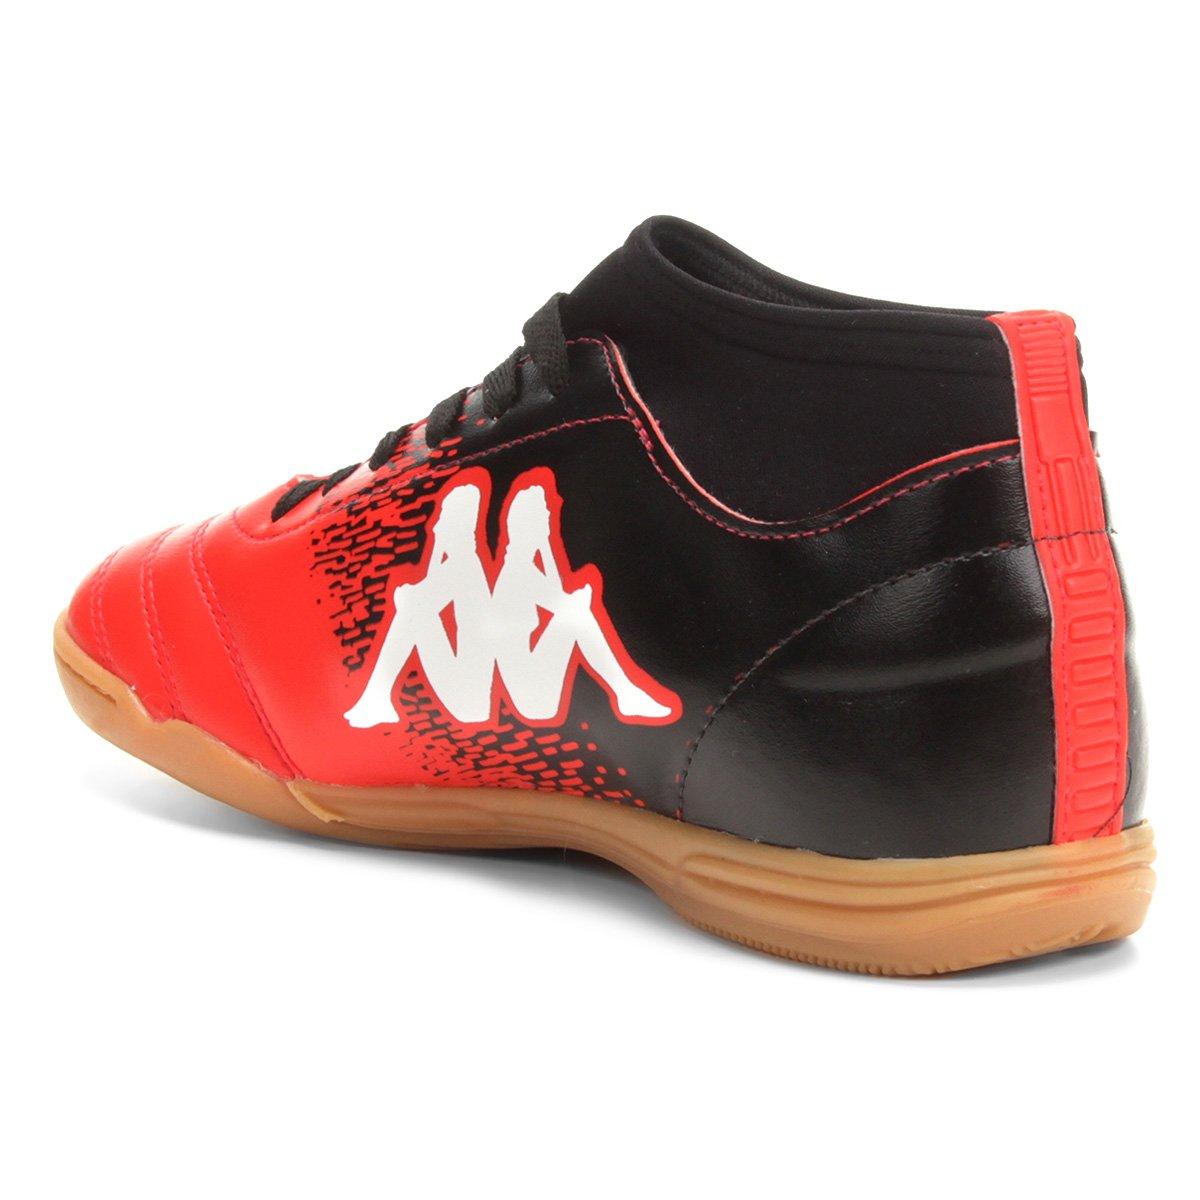 Chuteira Futsal Kappa Agility - Vermelho e Branco - Compre Agora  476125b2970a5